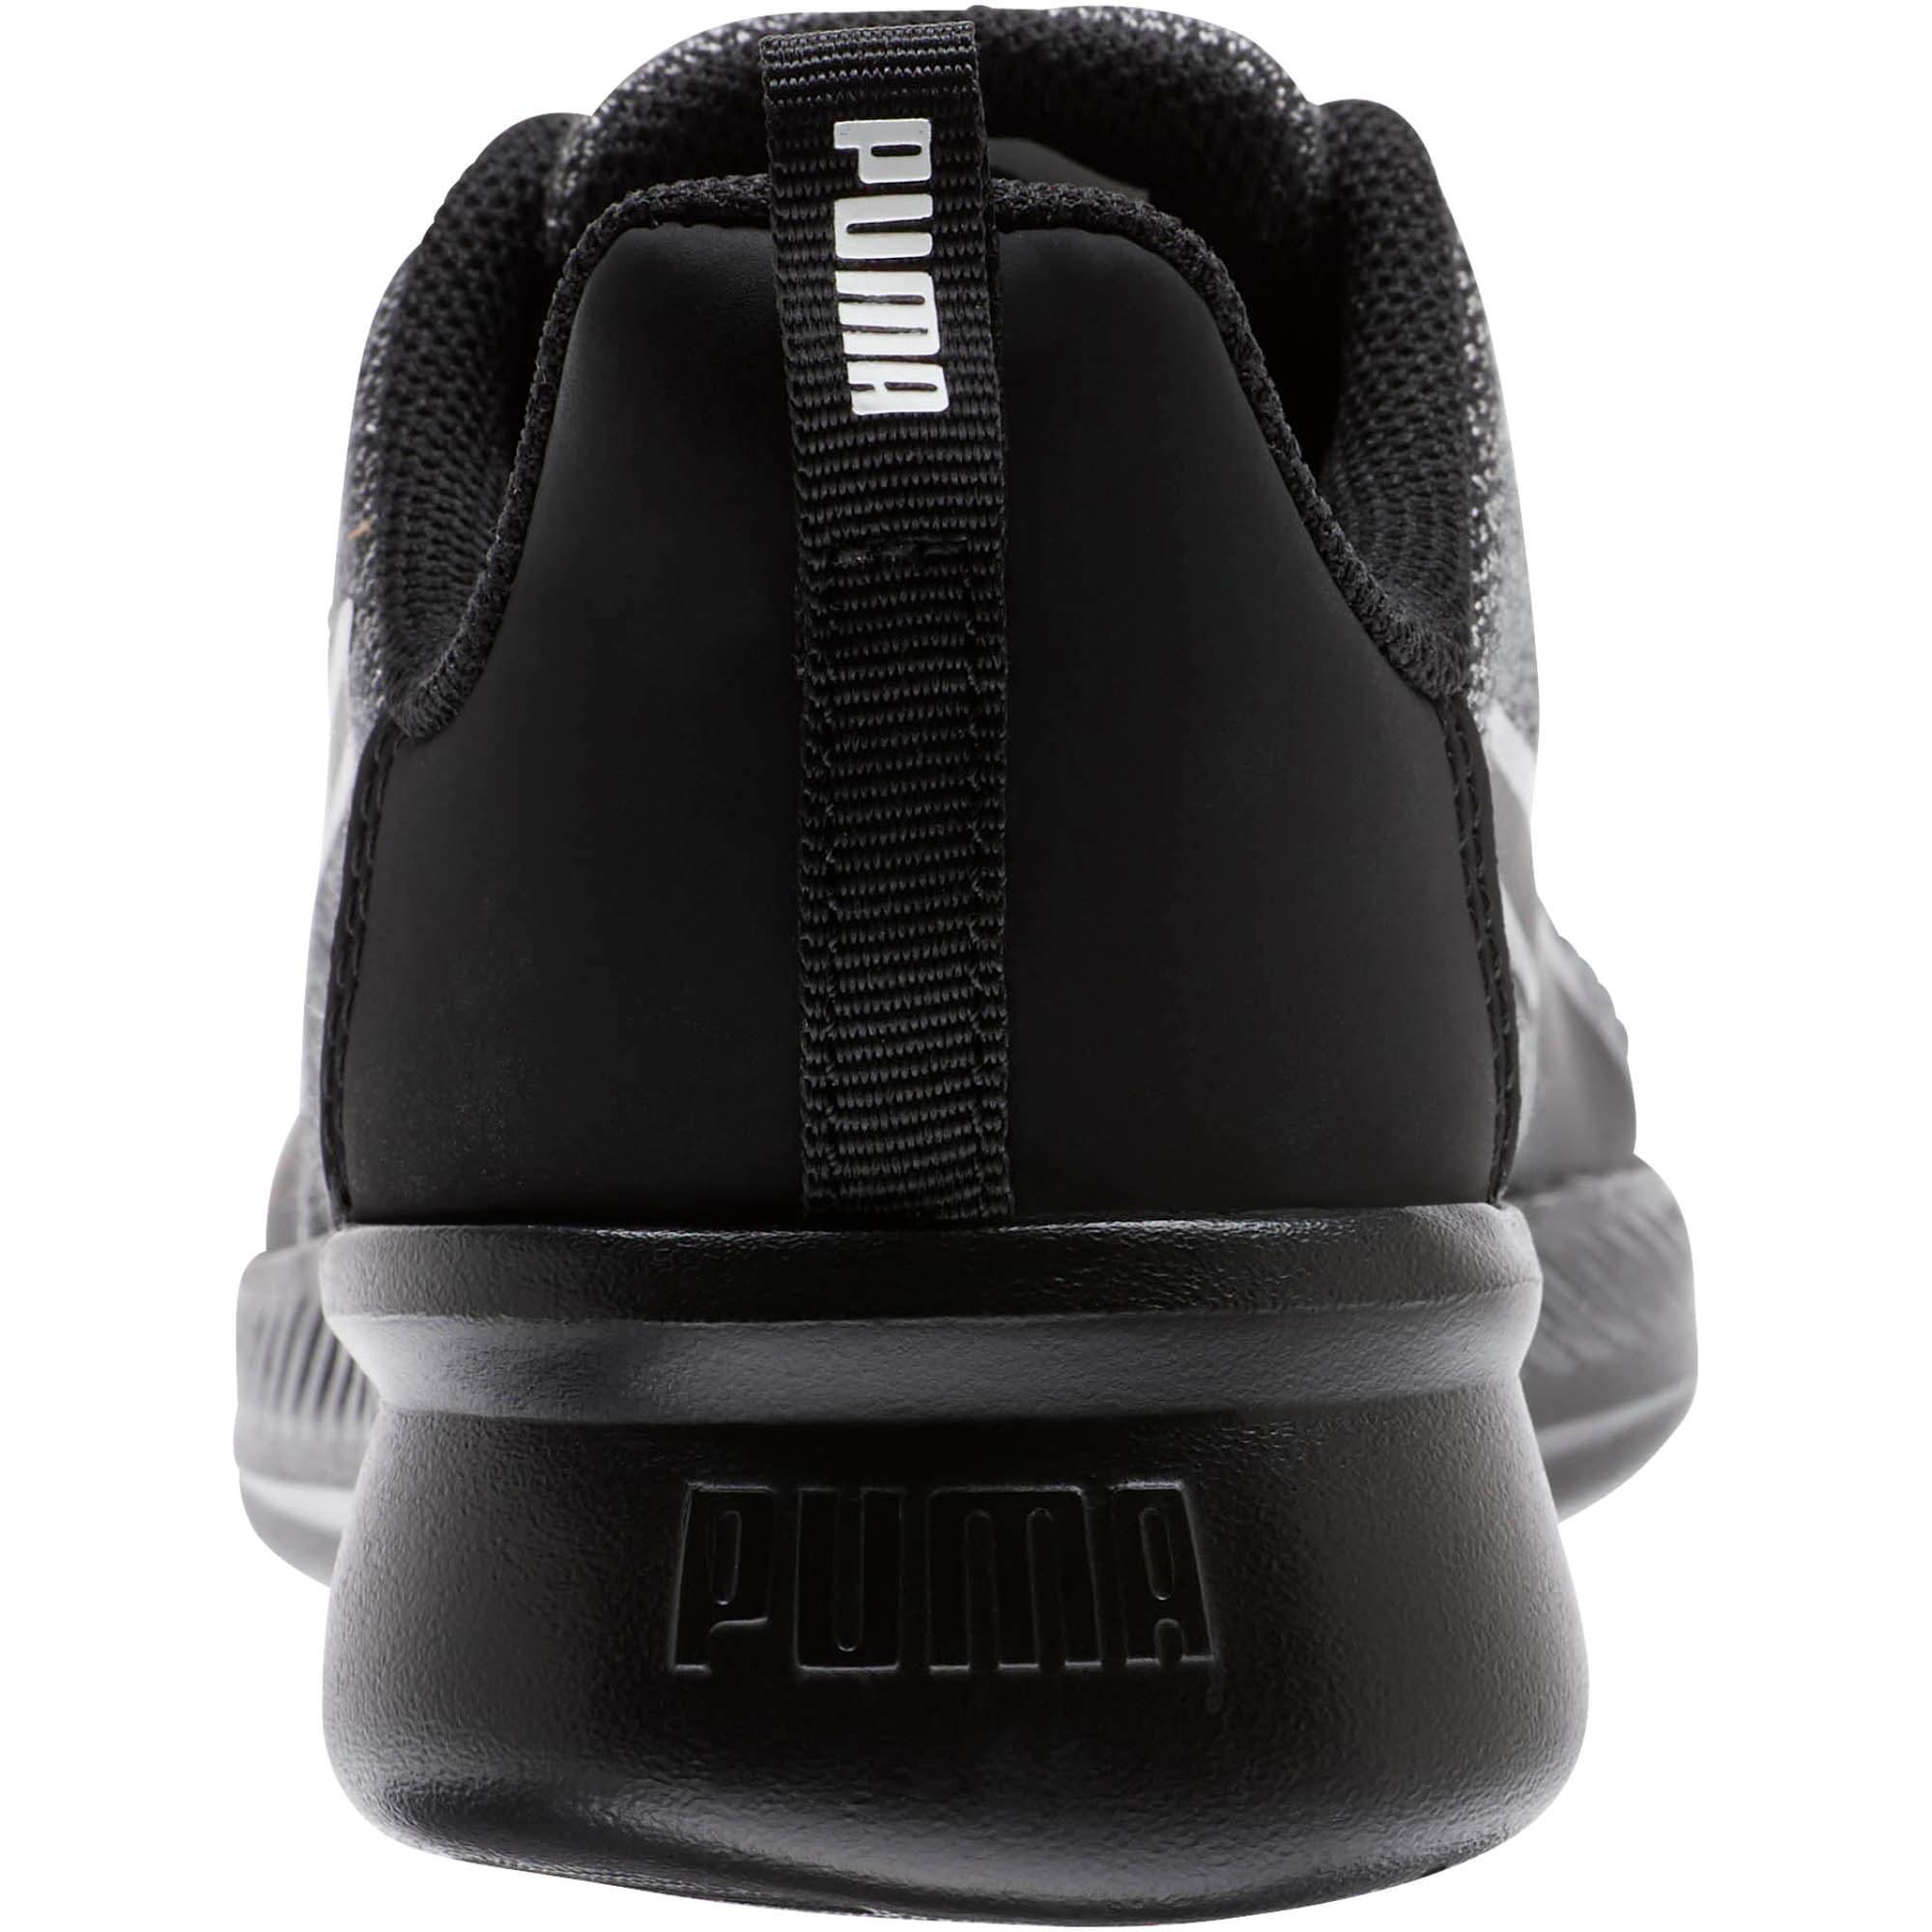 Thumbnail 3 of Tishatsu Runner Knit Little Kids' Shoes, Puma Black-Puma White, medium